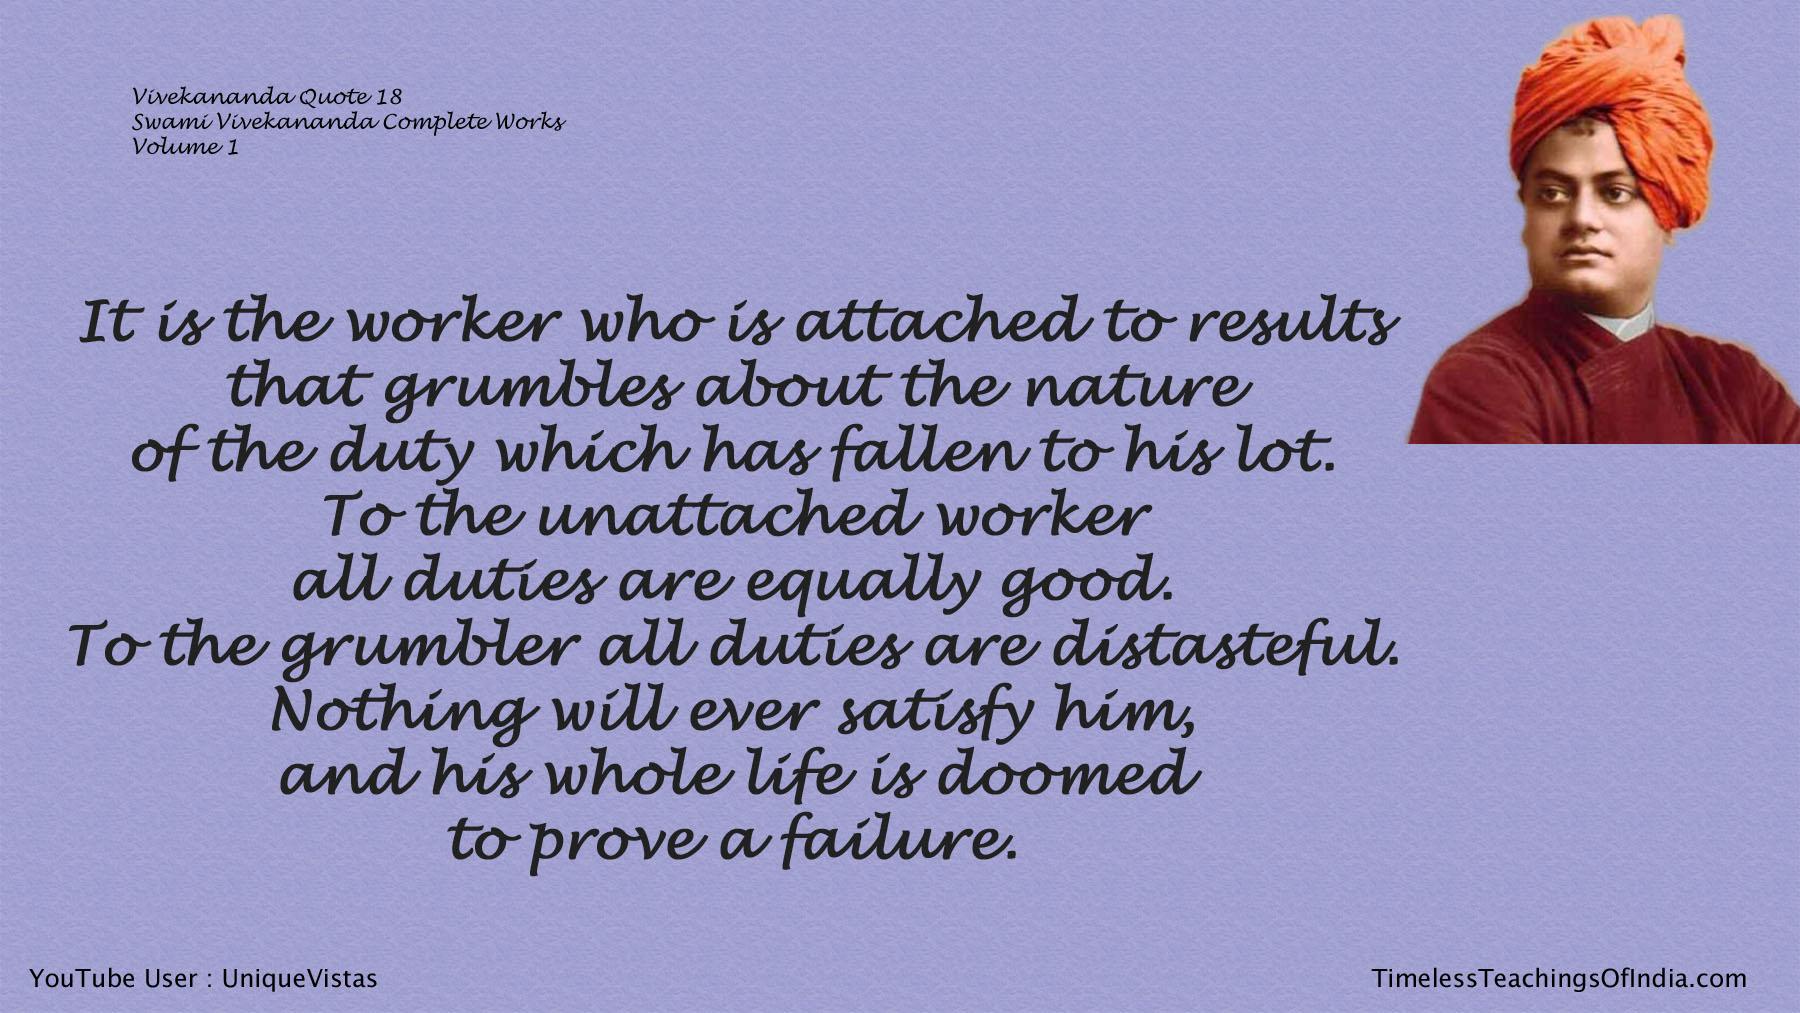 Vivekananda Quote 18